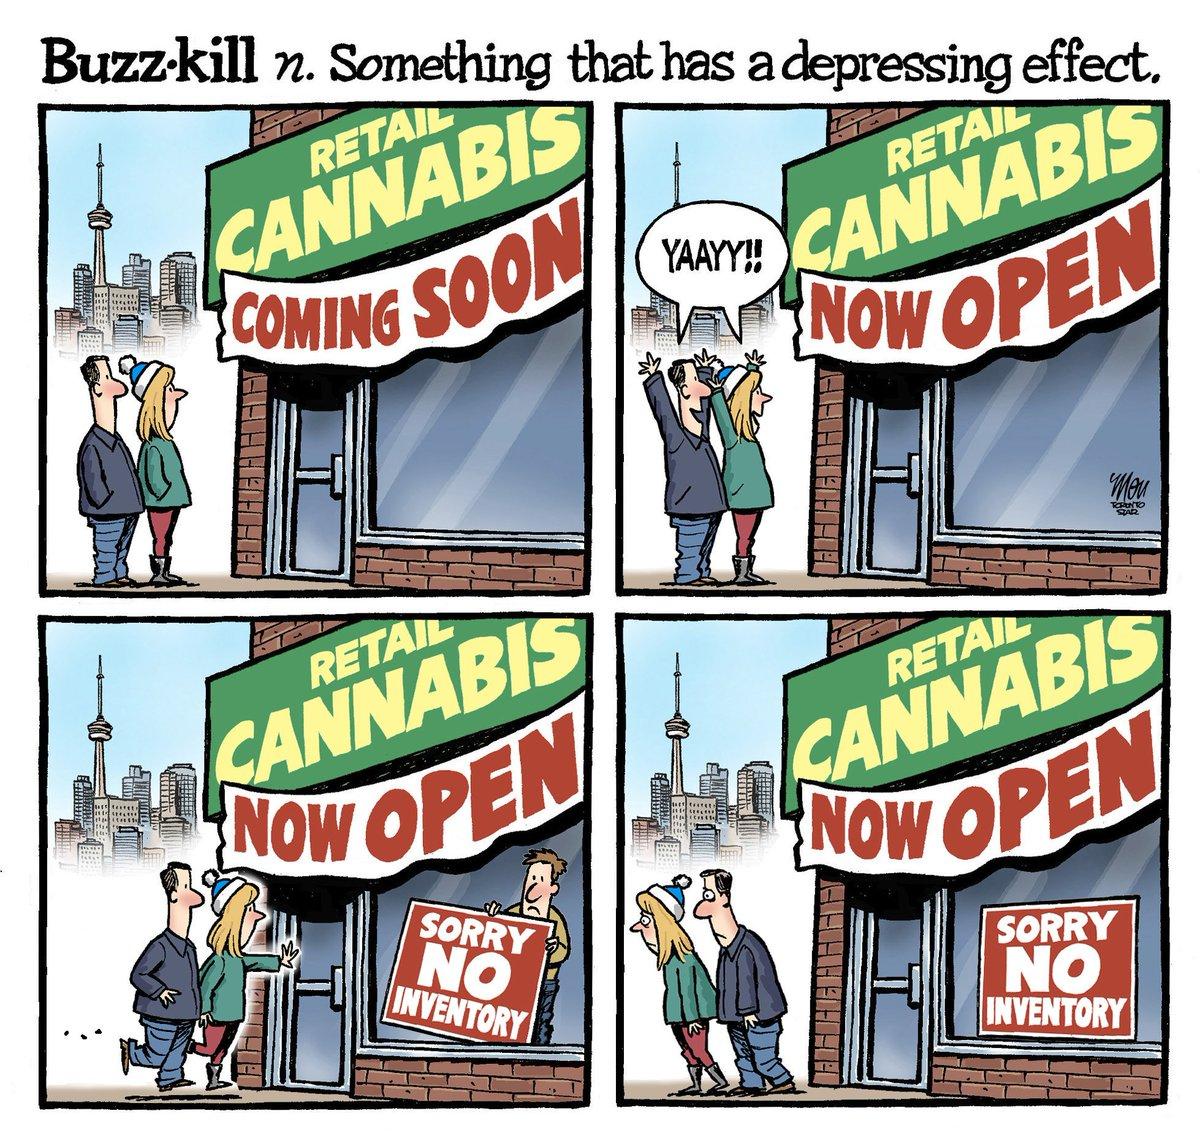 Here's today's #cannabiscanada cartoon in @TorontoStar